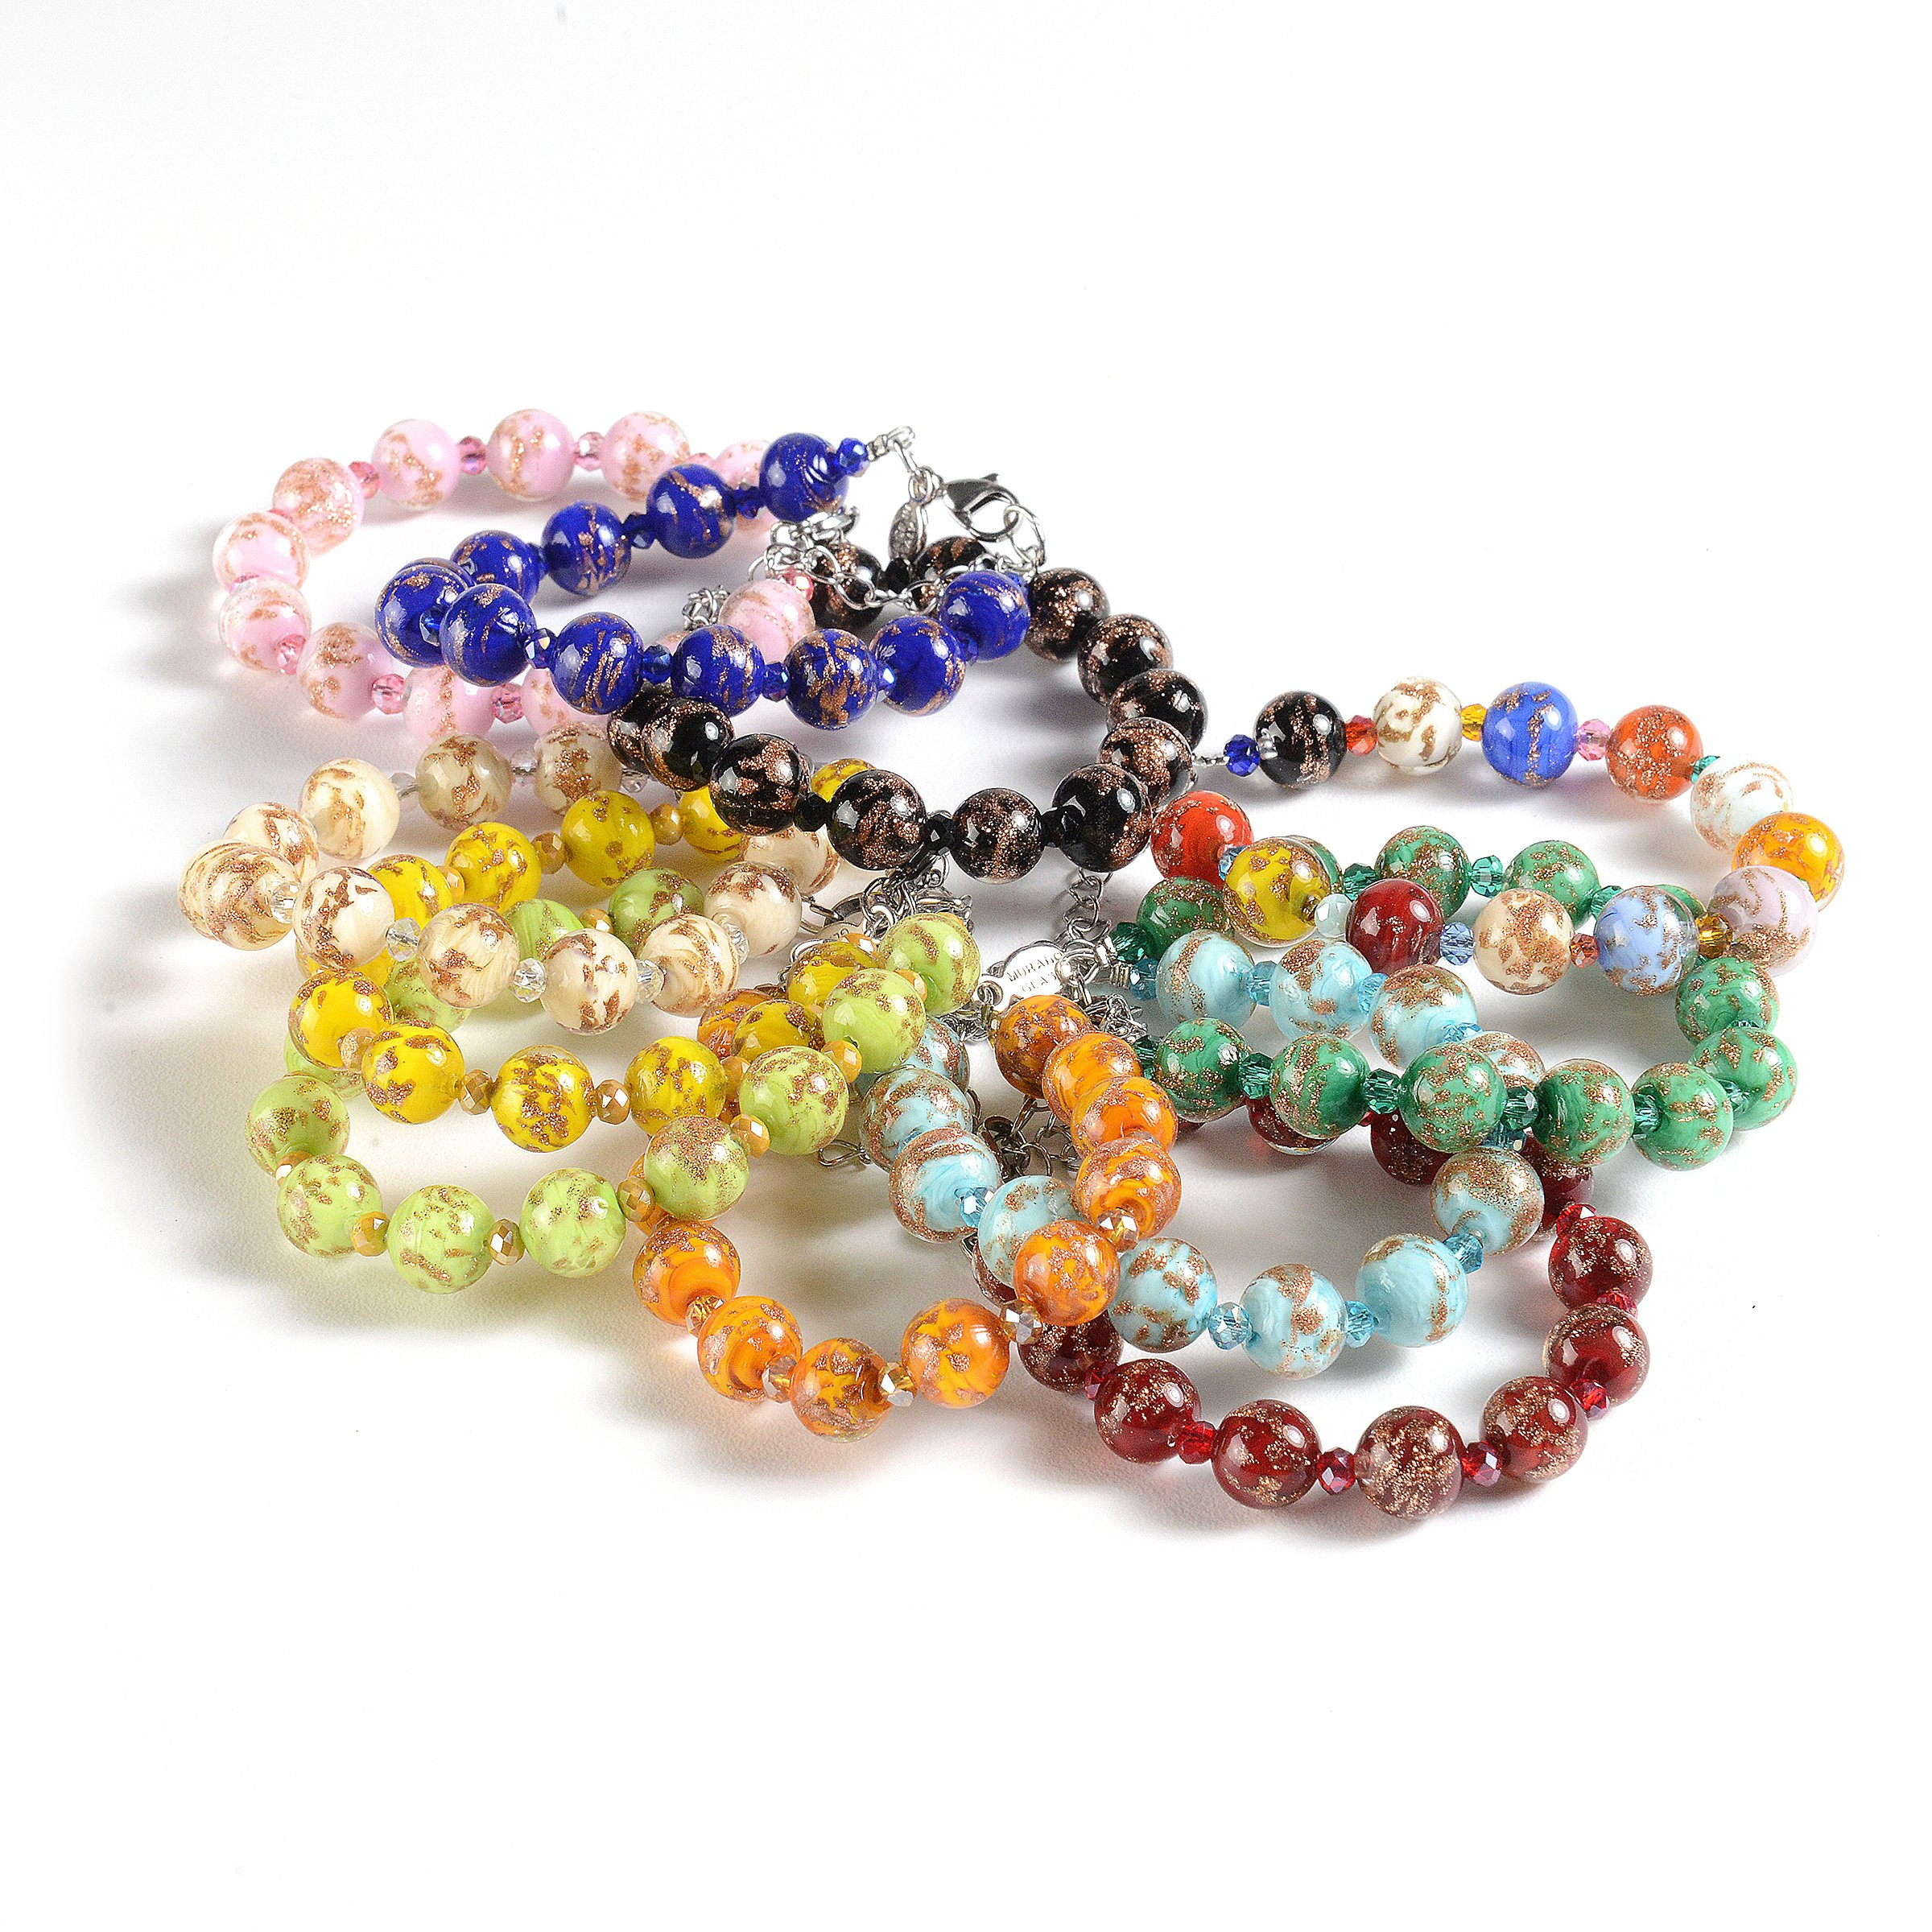 Murano Glass Jewelry, Handmade Vibrant Murano Glass Beads, Hypoallergenic Zamak Clasp, Each Murano Charm Bead is Unique, Colorful, and Exquisite - Murano Glass Bracelet for Women, Imported by EMBRACE LA GRANDE VITA (Image #3)